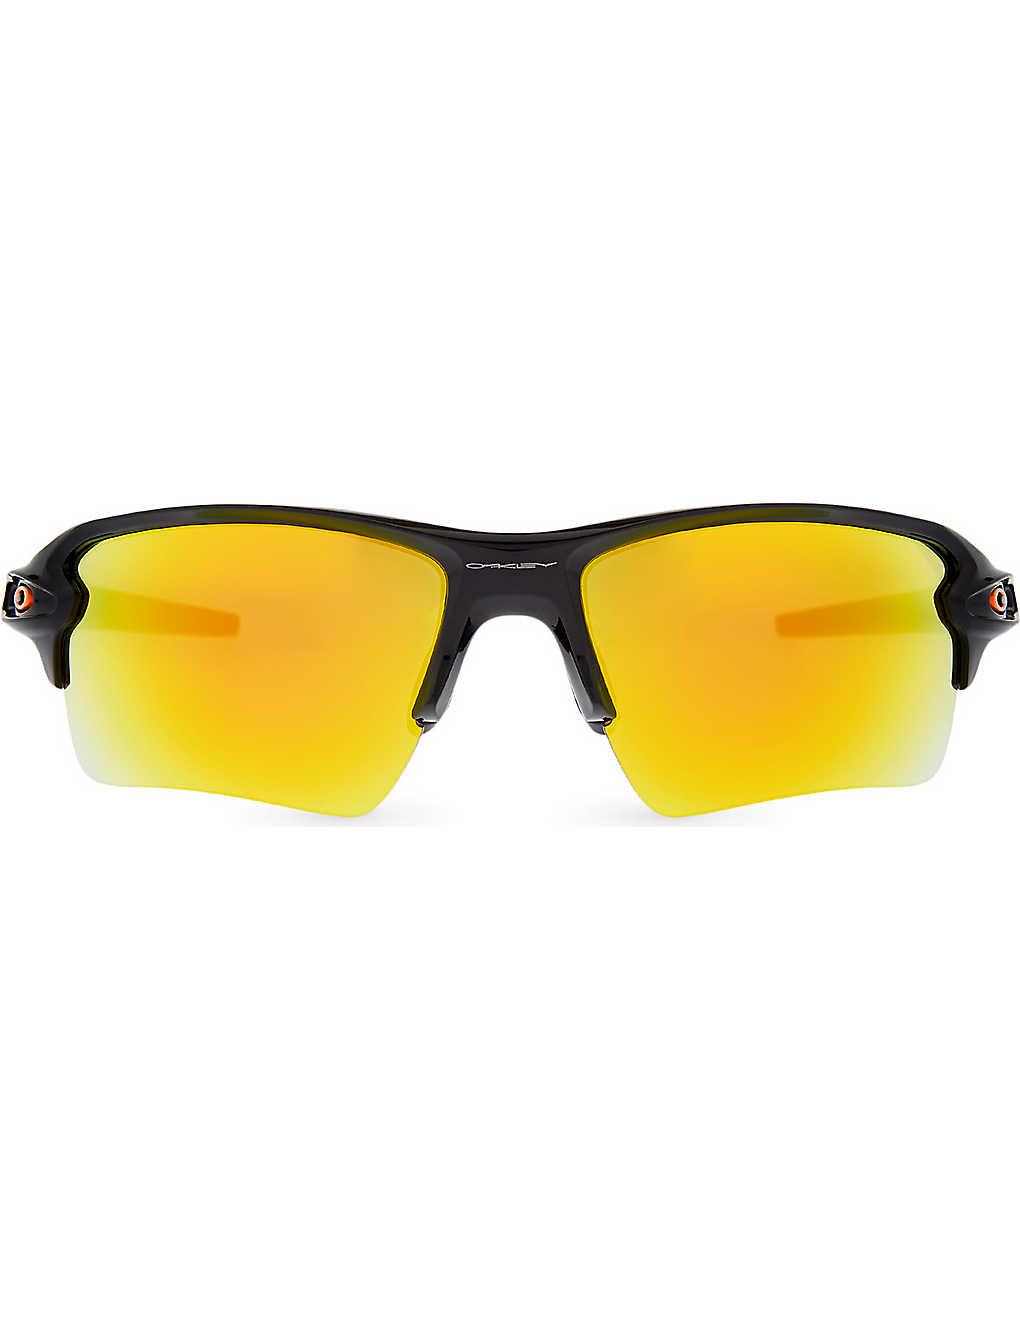 abad6bbd66 OAKLEY - Flak 2.0 XL Team Color wrap-around sunglasses